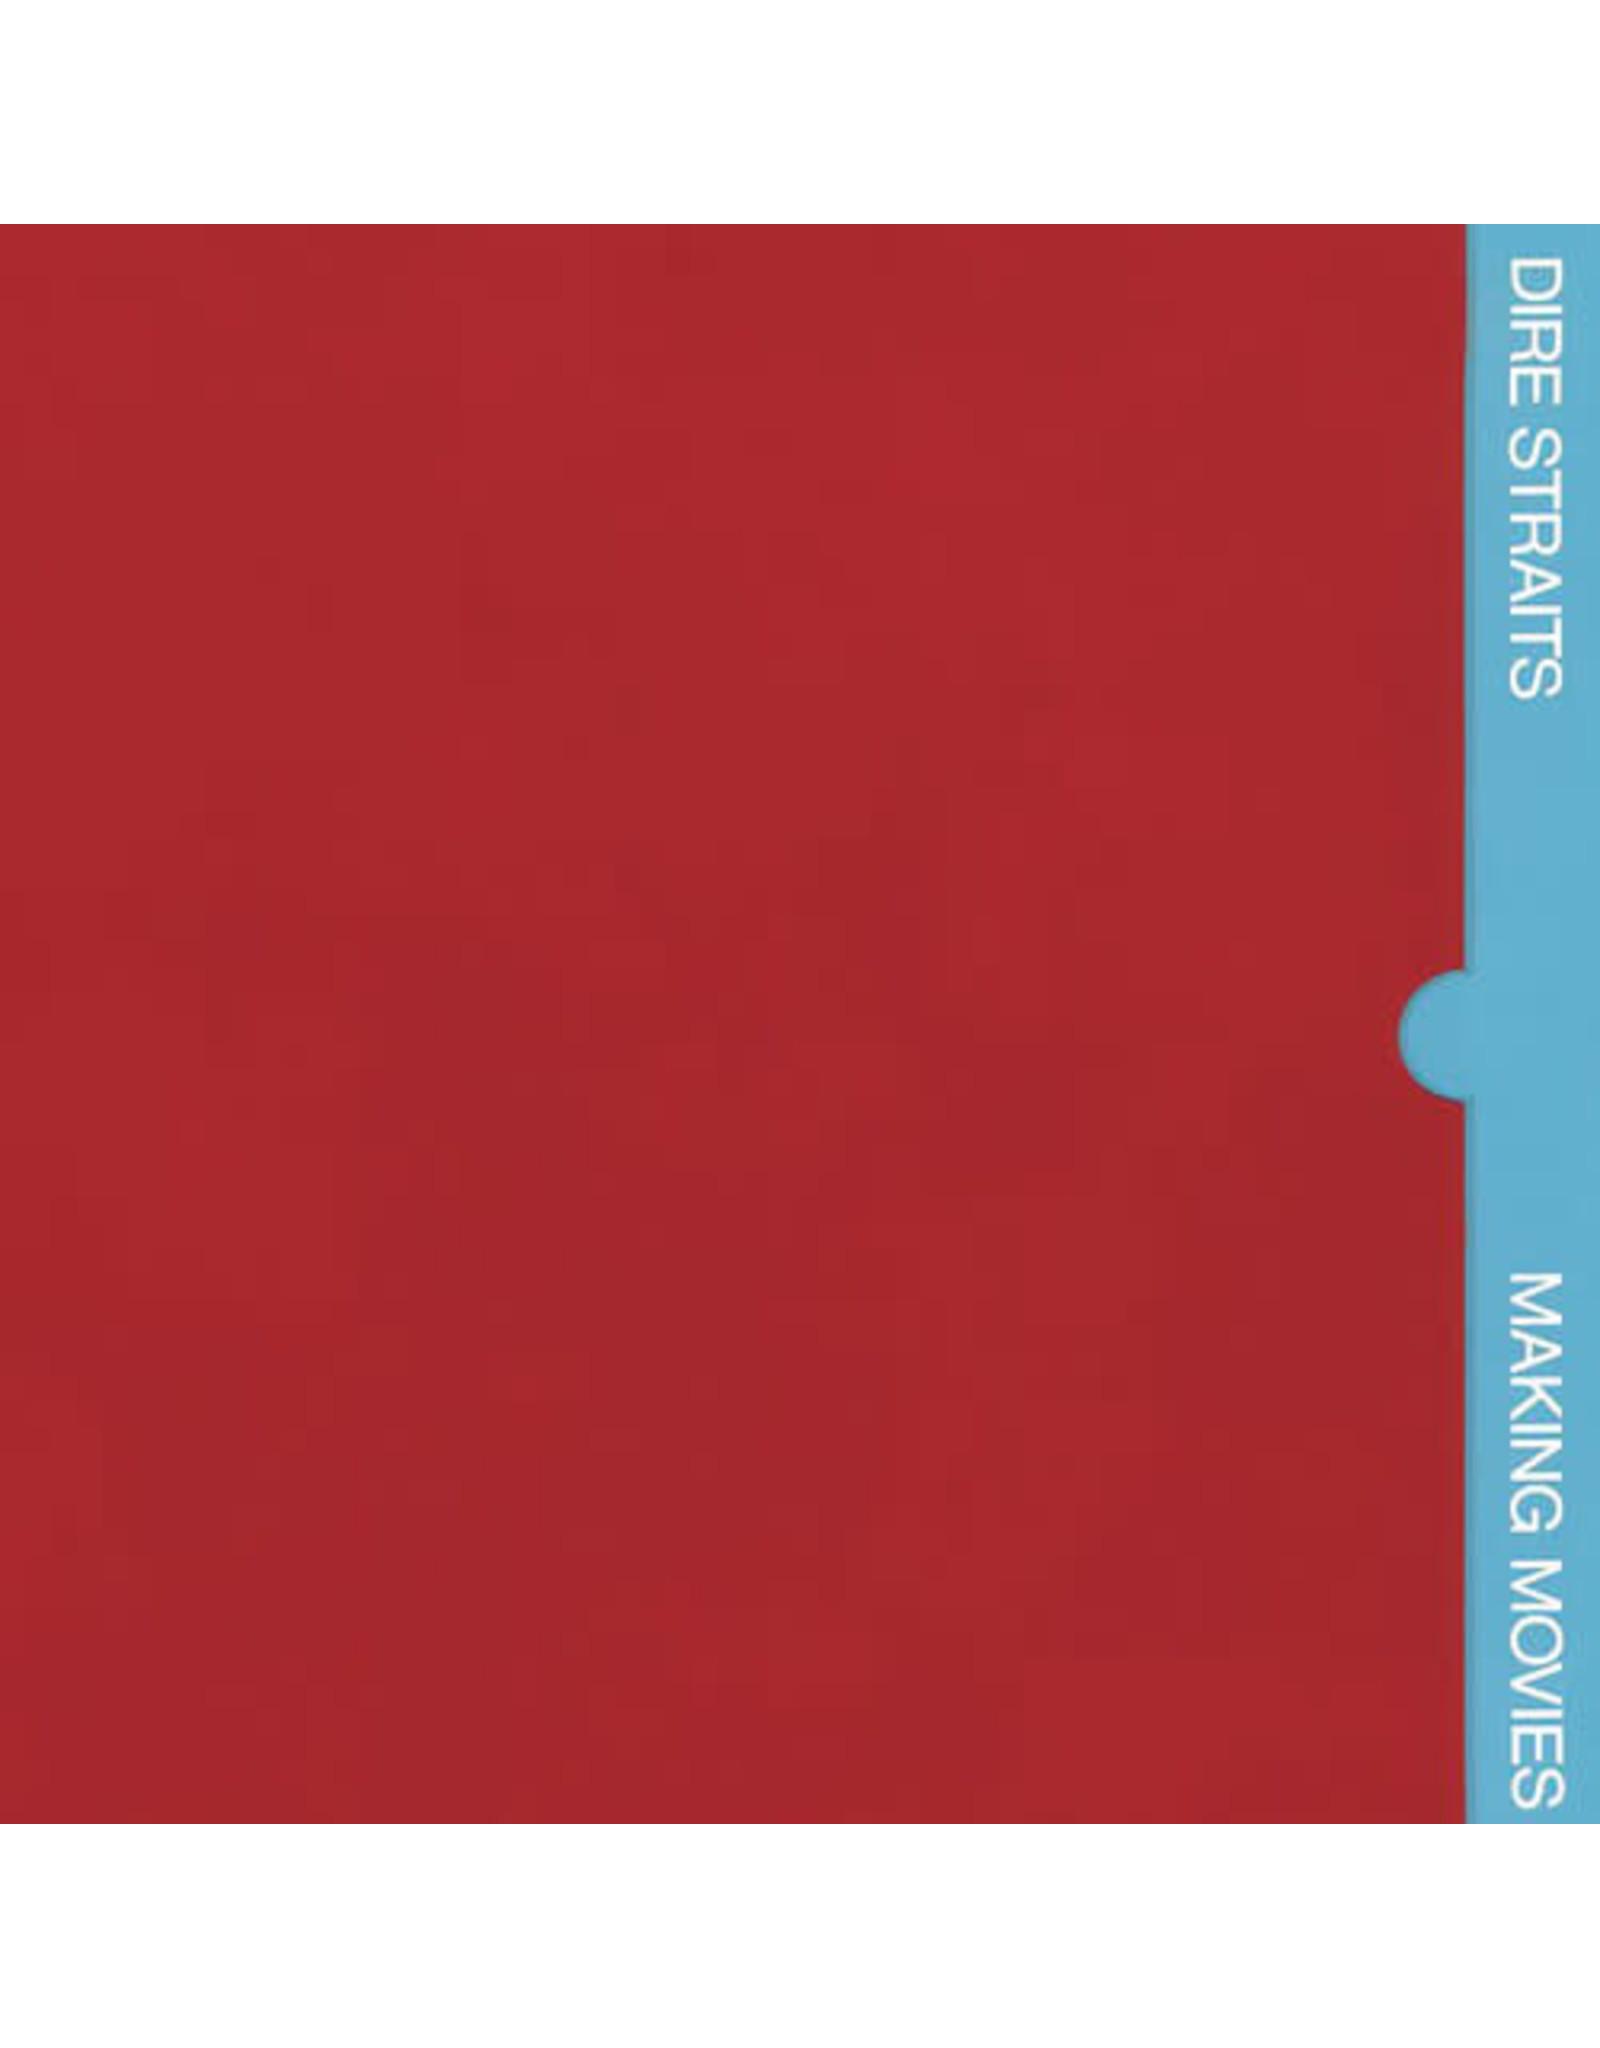 New Vinyl Dire Straits - Making Movies LP